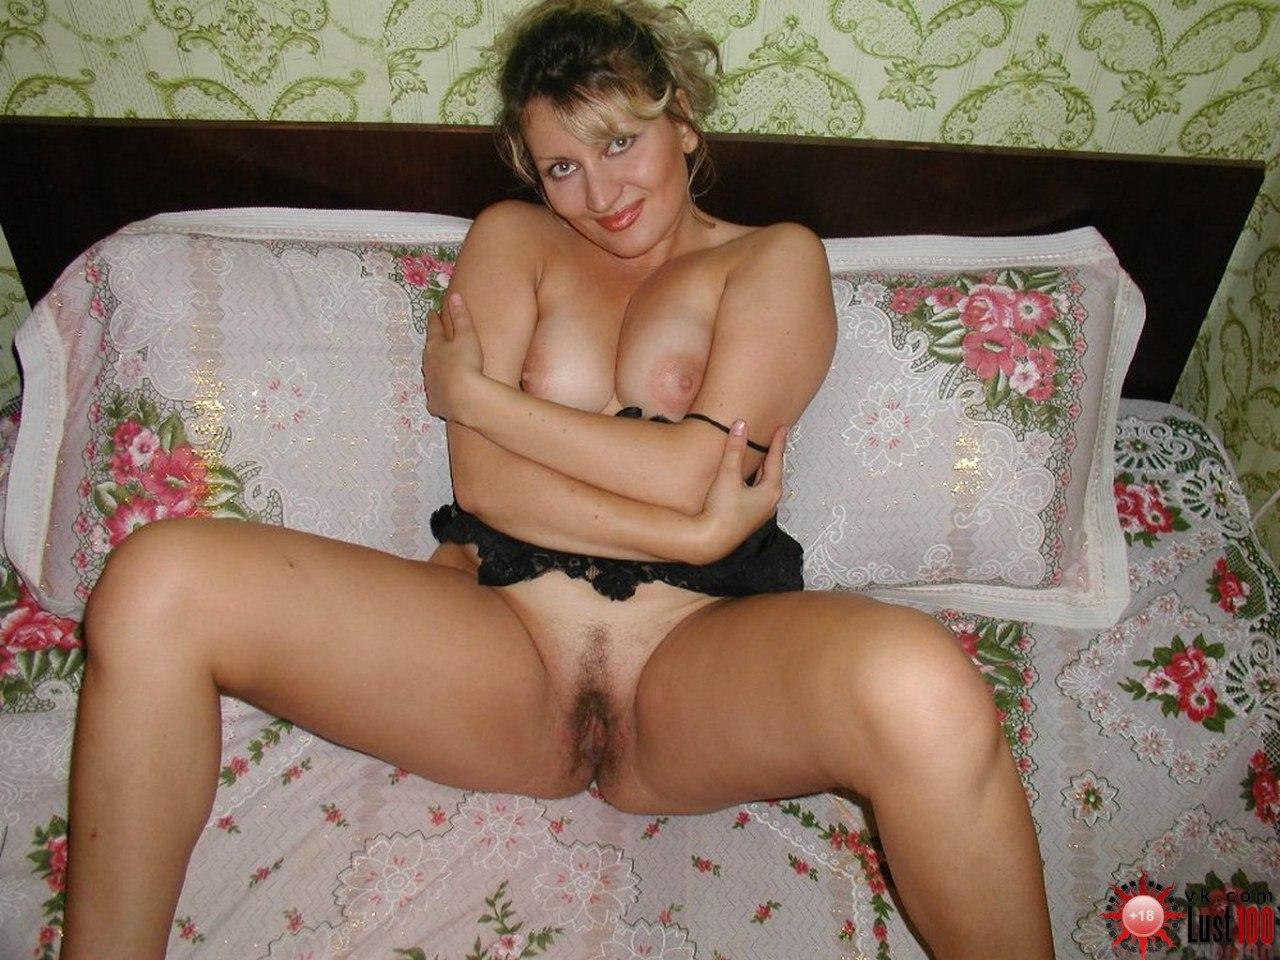 Русские до со взрослыми порно фото 15-48